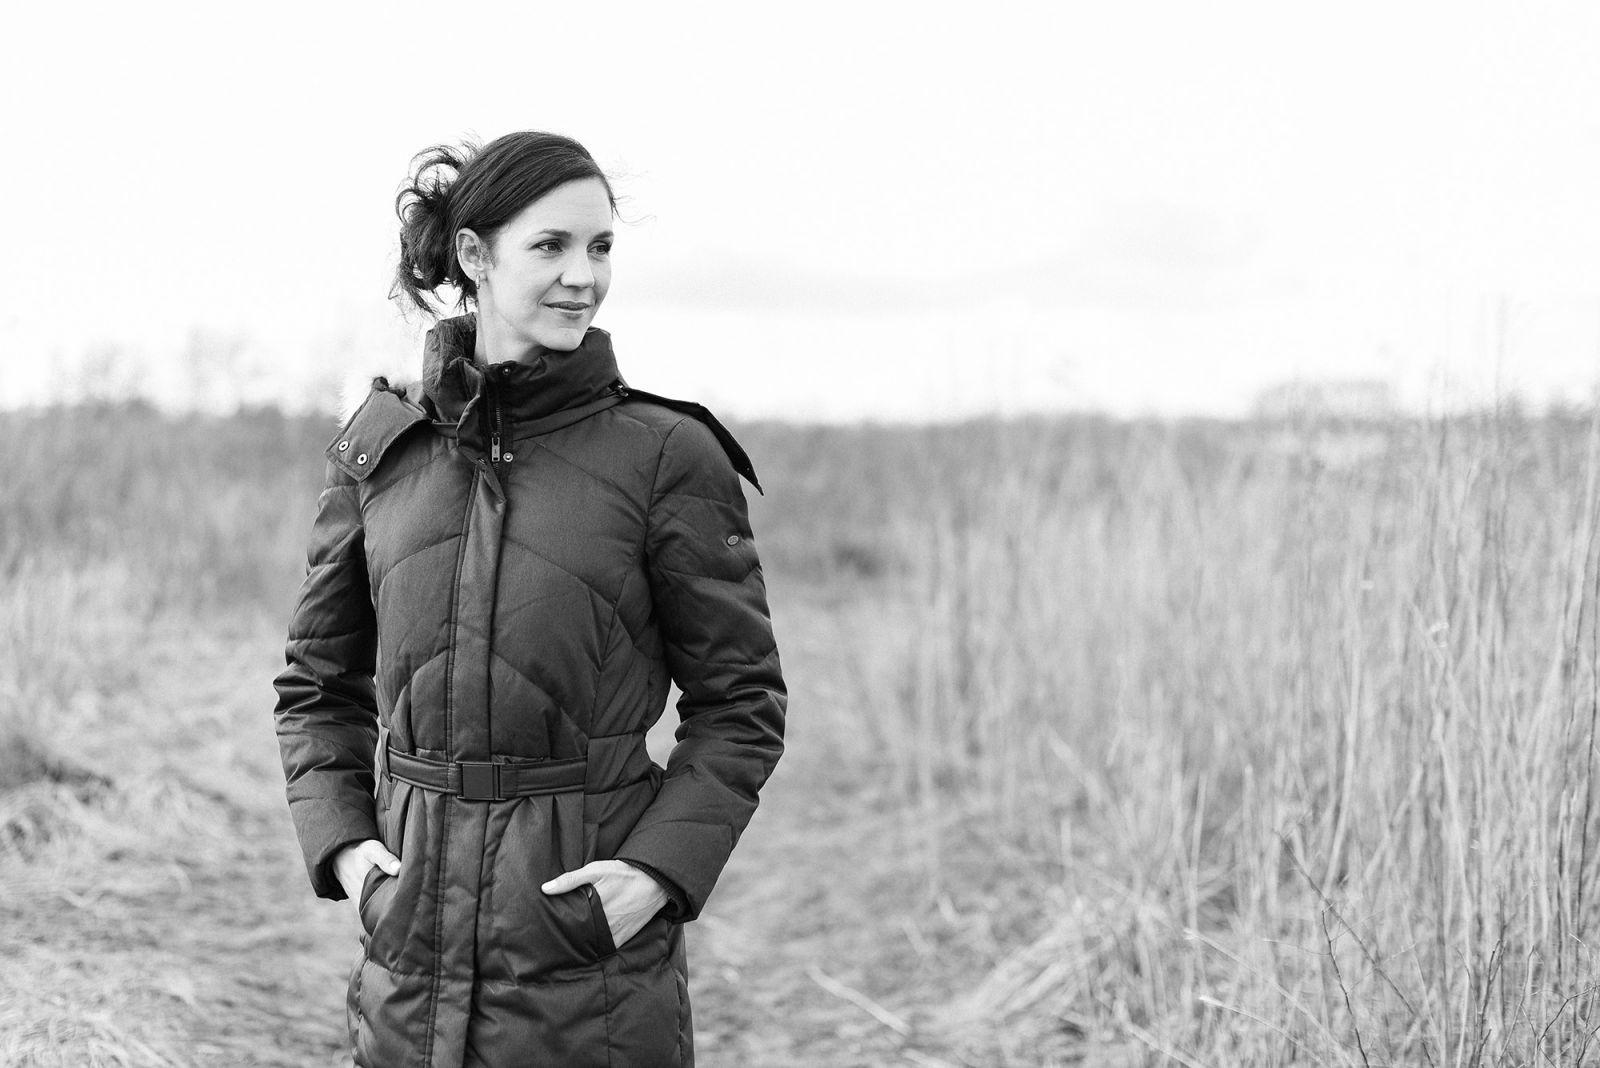 Portret, portretfotografie, ondernemende vrouwen, ondernemer, beeldbank, beeldbankshoot, portretshoot, Culemborg, Mirjam Broekhof Fotografie